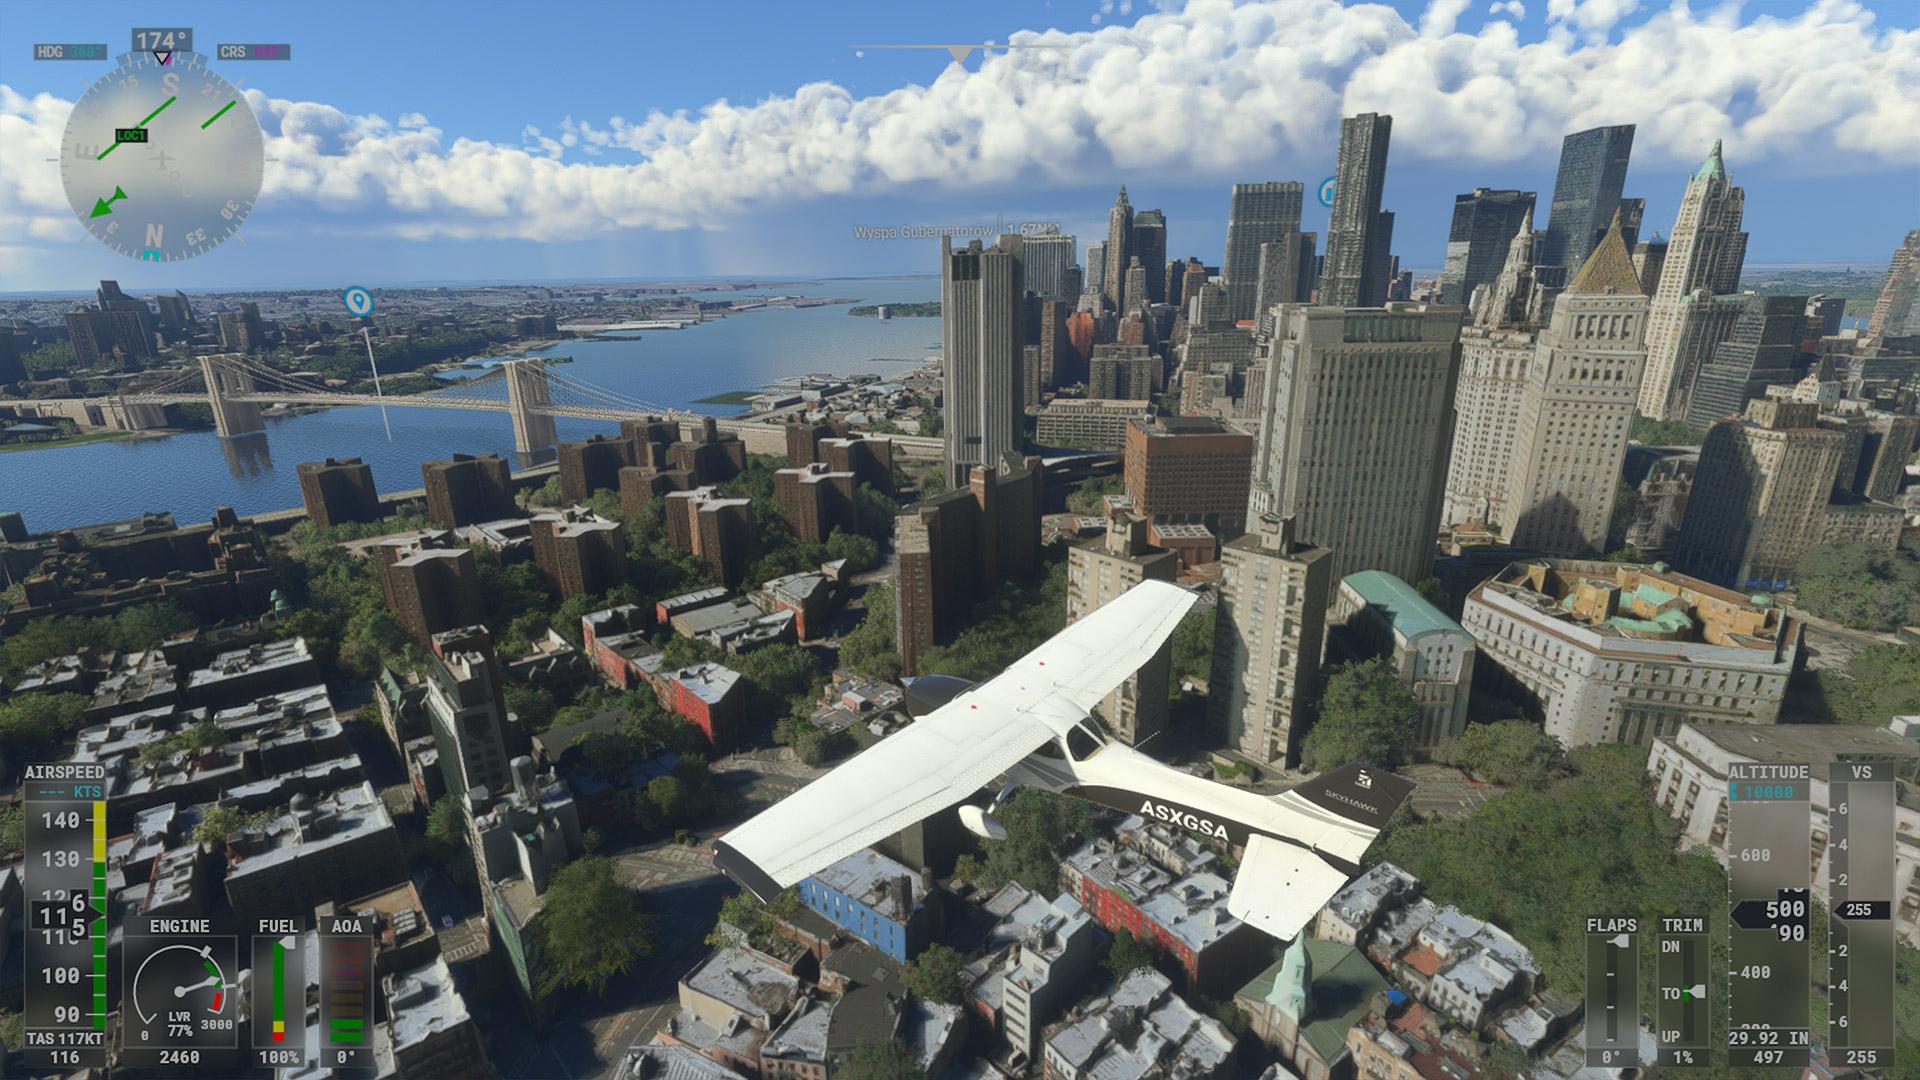 Recenzja Microsoft Flight Simulator na Xbox Series S - fot. Tabletowo.pl